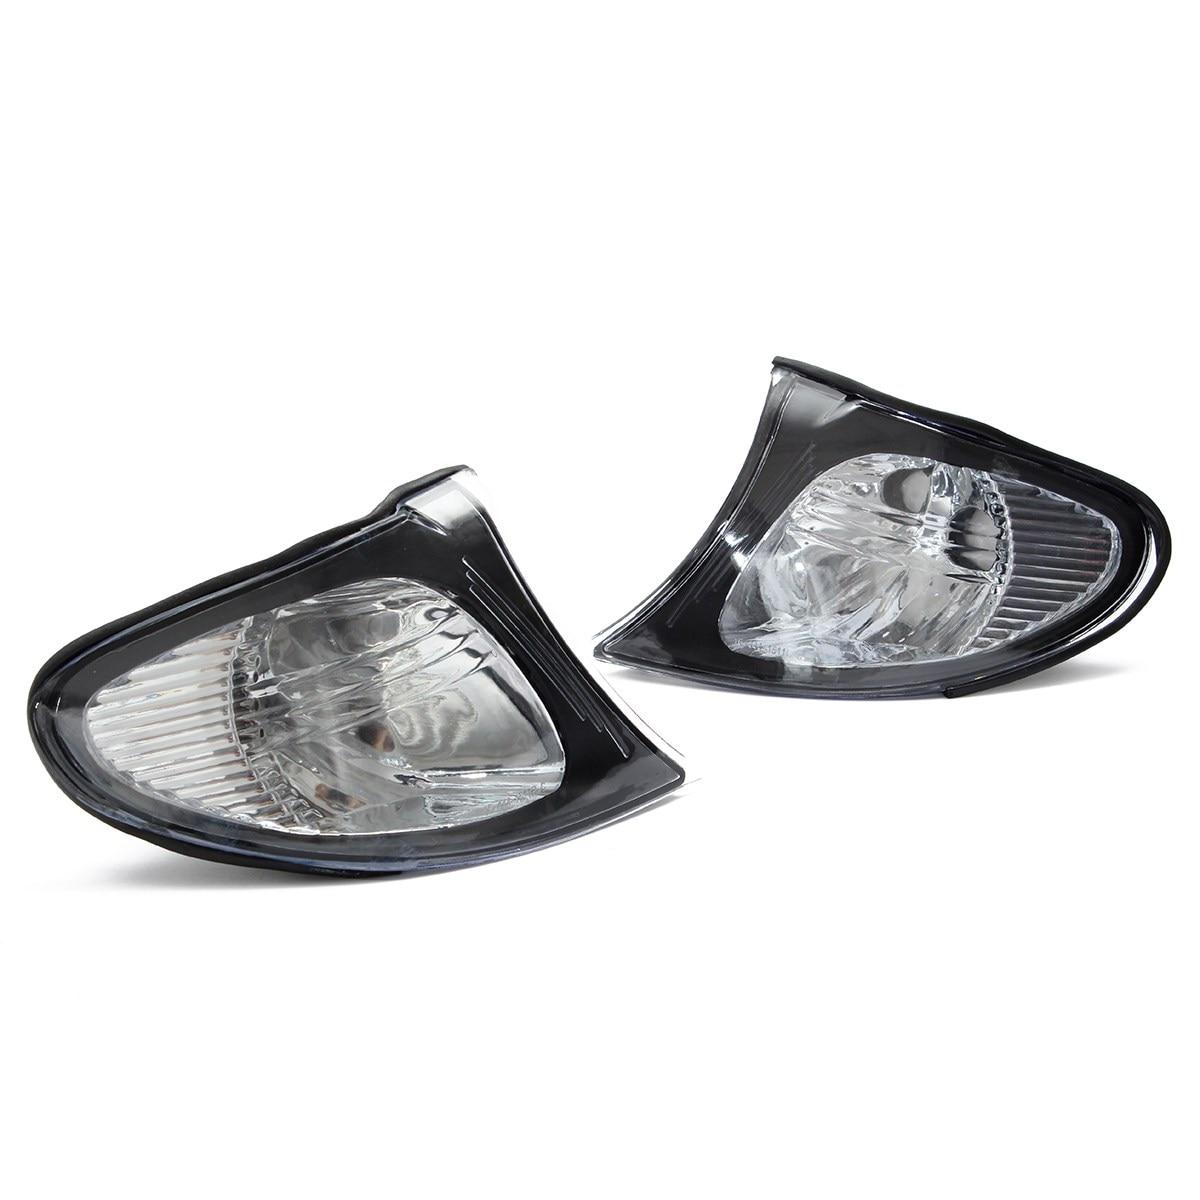 ФОТО 2016 New 1 Pair Brand New Corner Lights Sidelights For BMW E46 3-Series 4DR 02-05